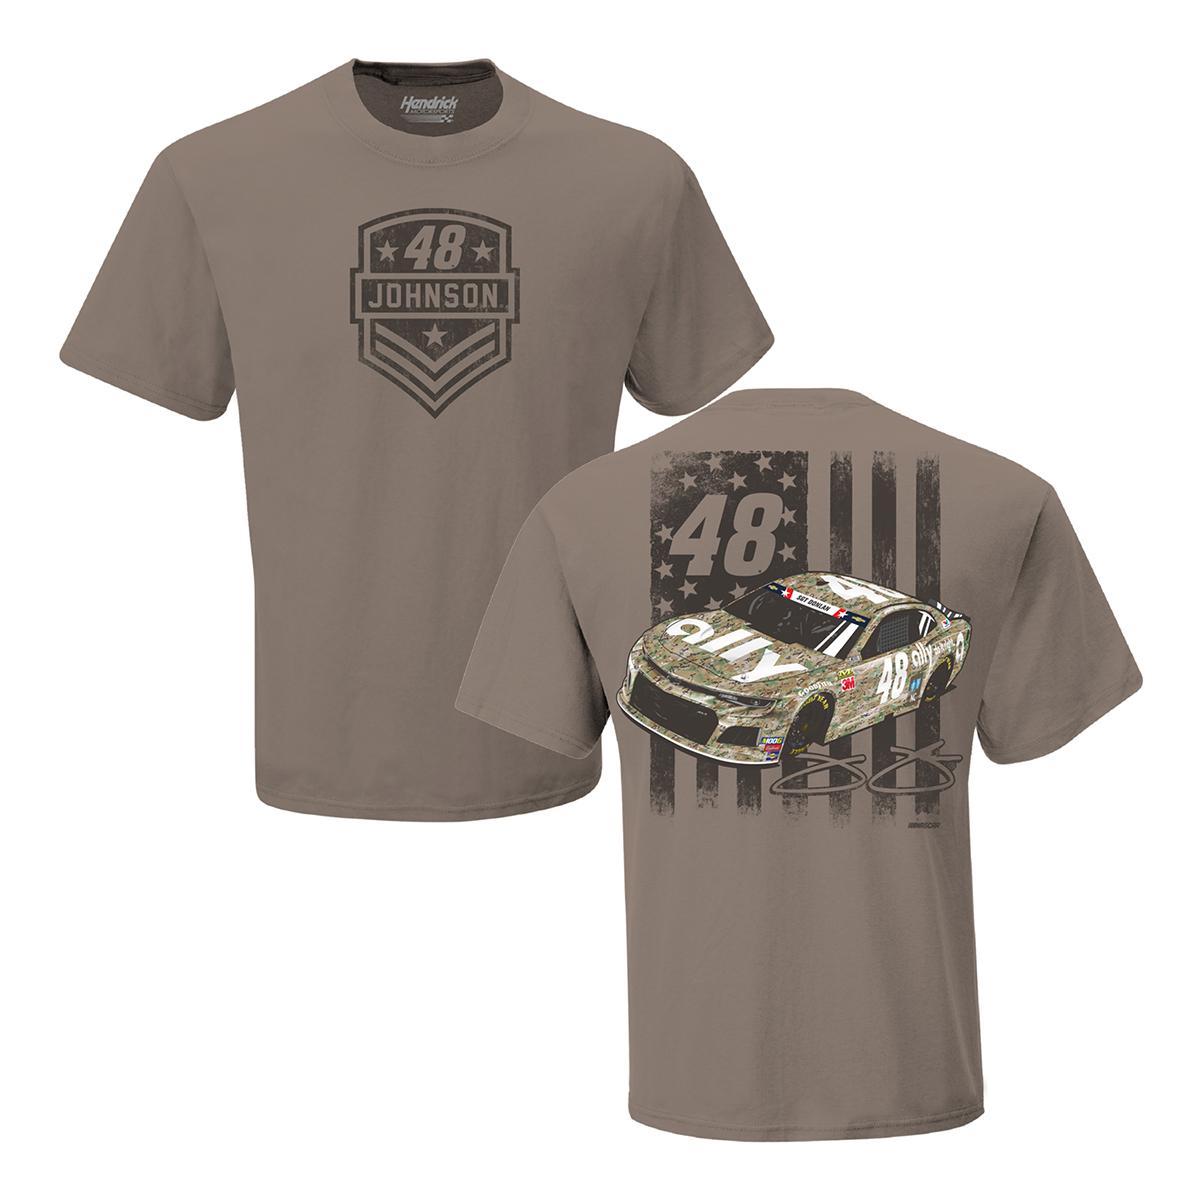 Jimmie Johnson 2019 NASCAR #48 Brown Patriotic T-shirt